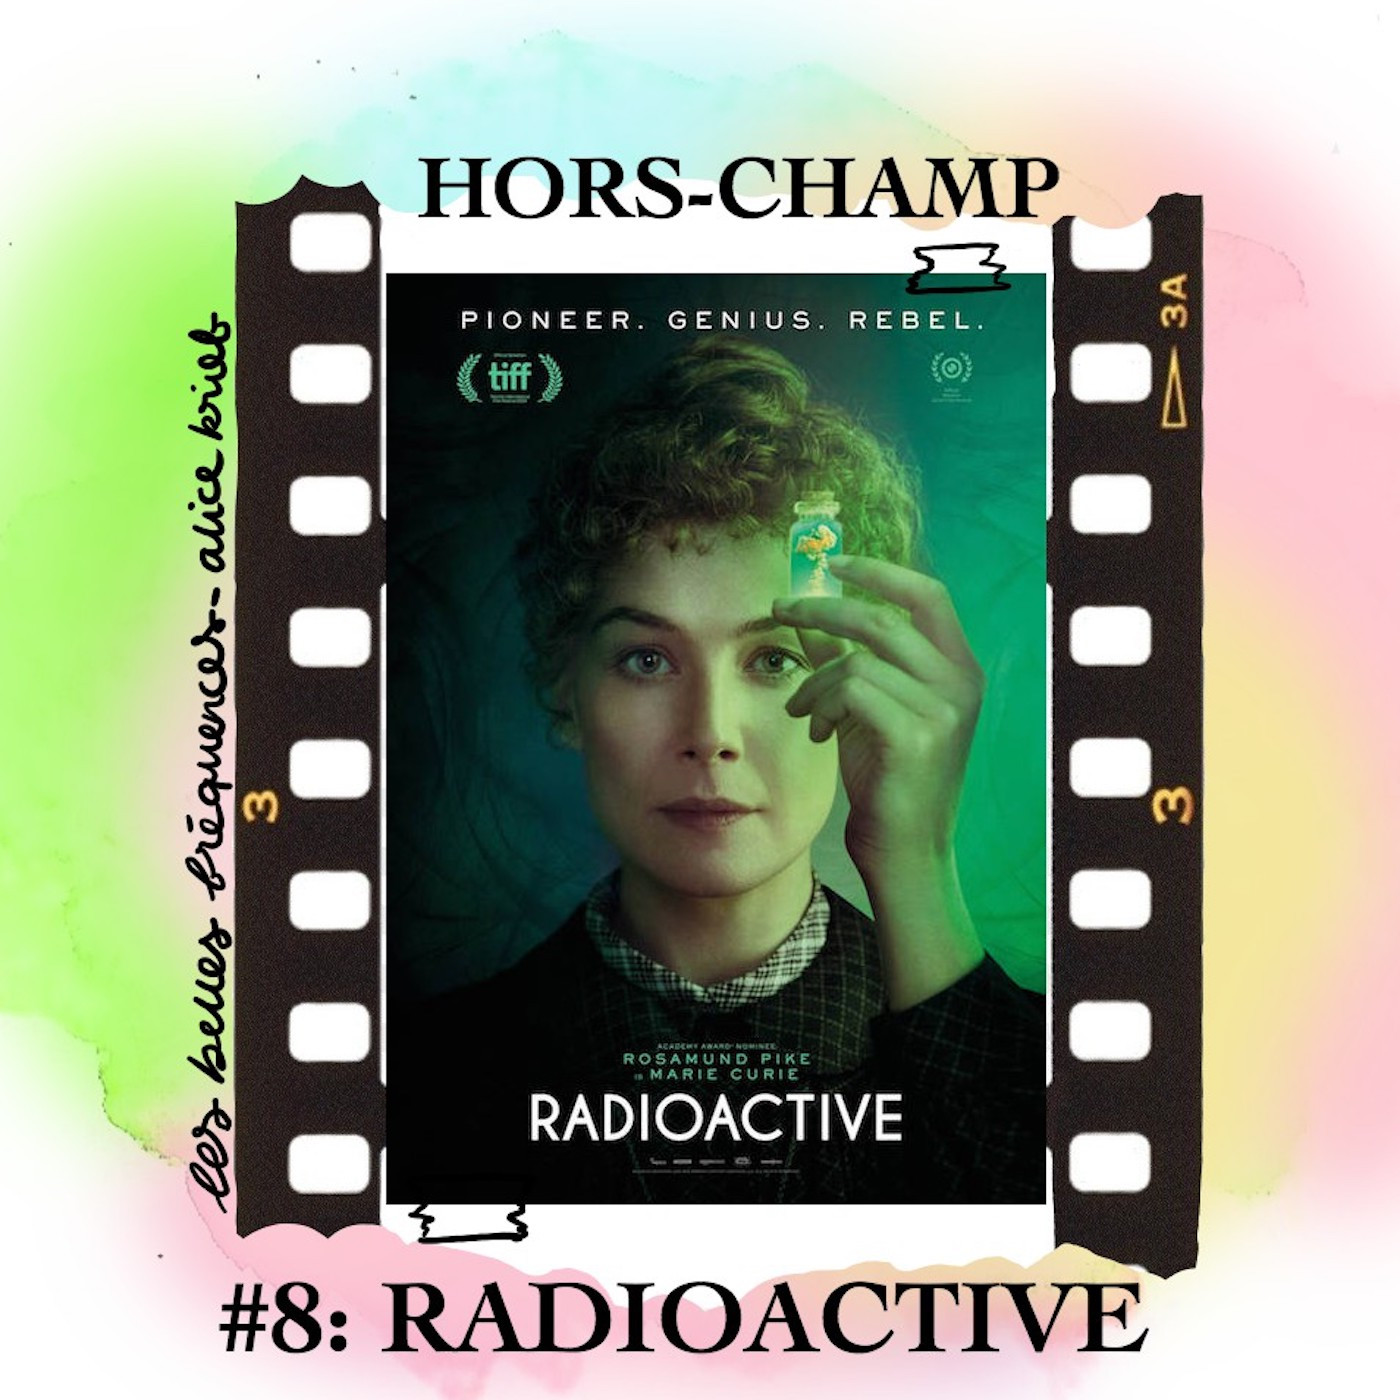 #8: Radioactive